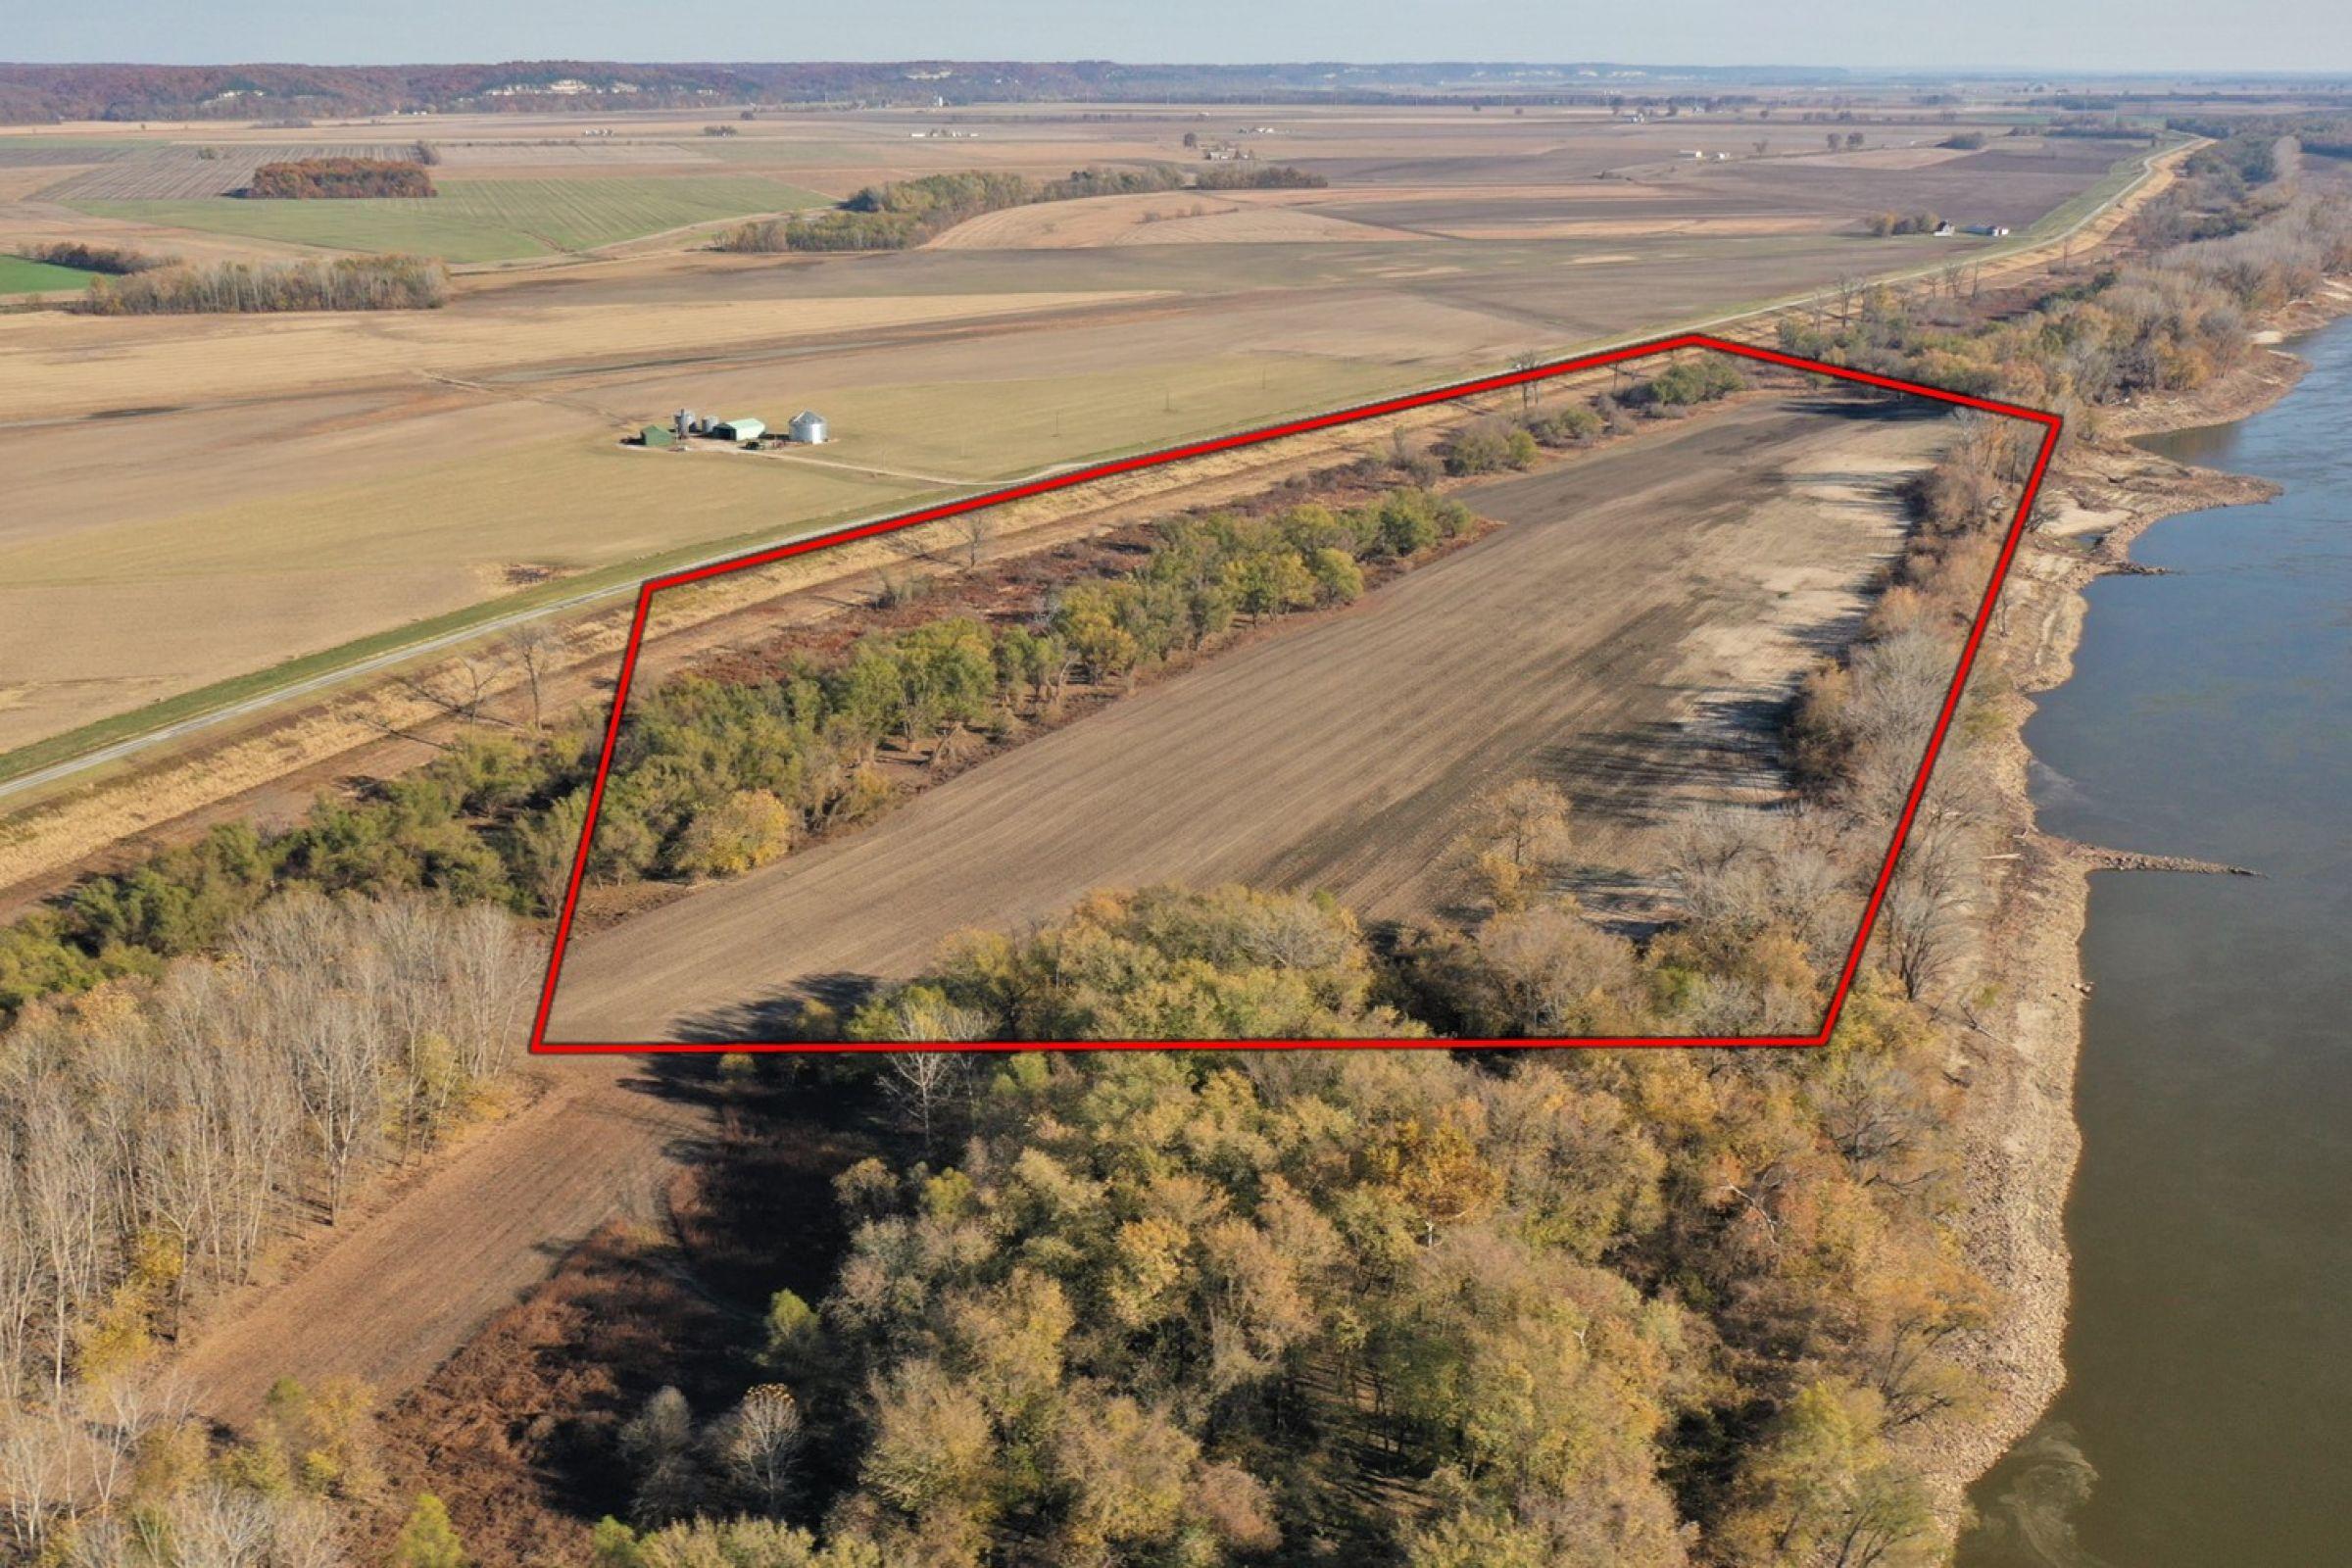 land-monroe-county-illinois-62-acres-listing-number-15265-2-2020-11-20-193128.jpg